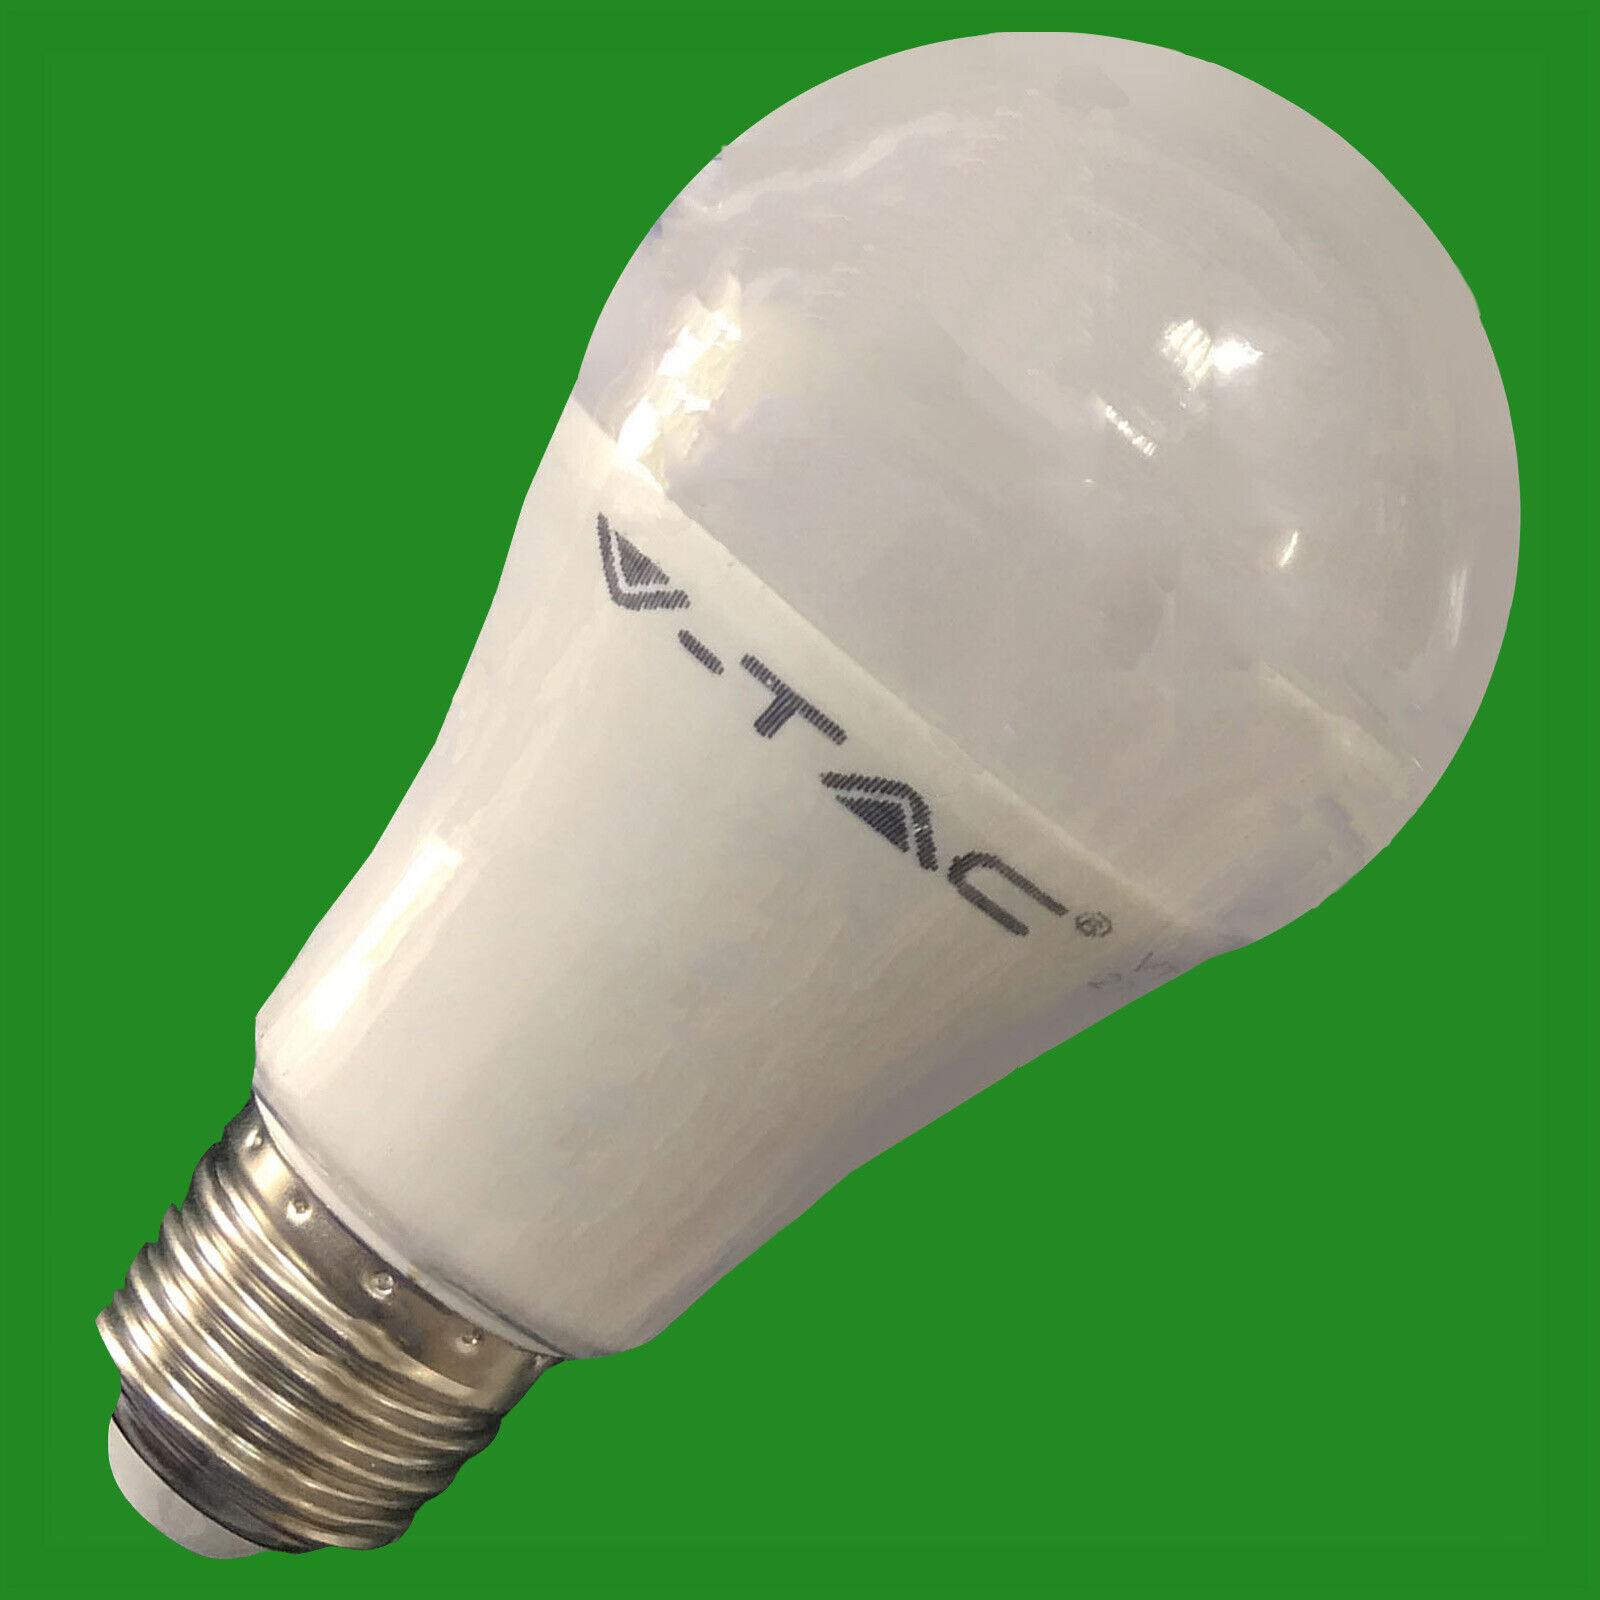 10x 12W LED A60 GLS Warm Weiß Light Bulb ES E27 Edison Screw Lamp Globe